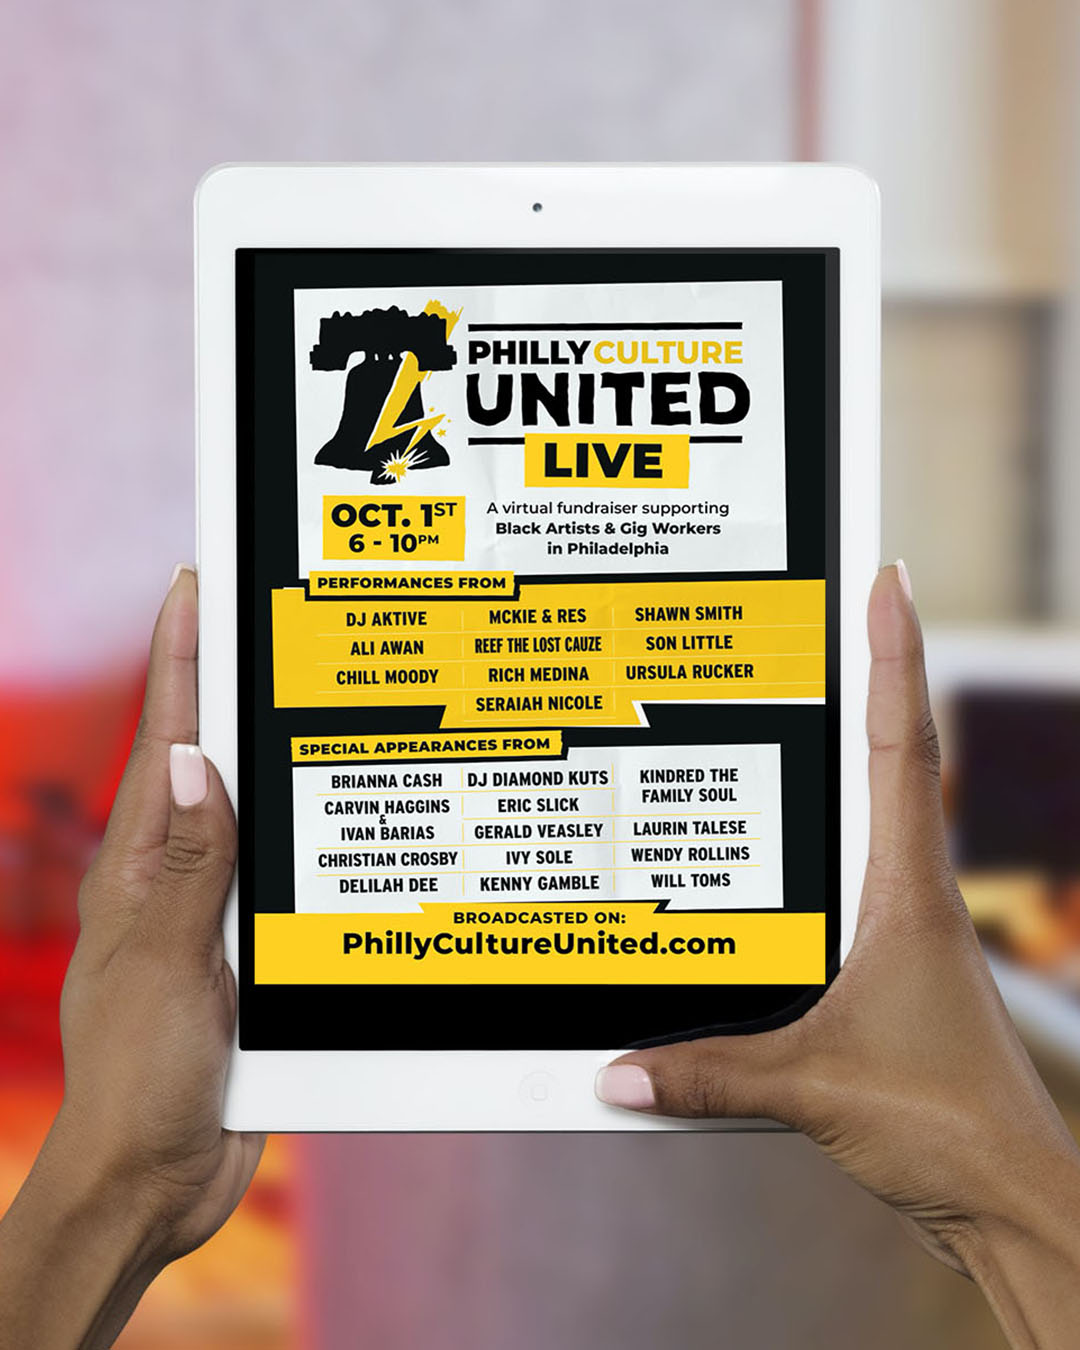 philly-culture-united-fund-raiser